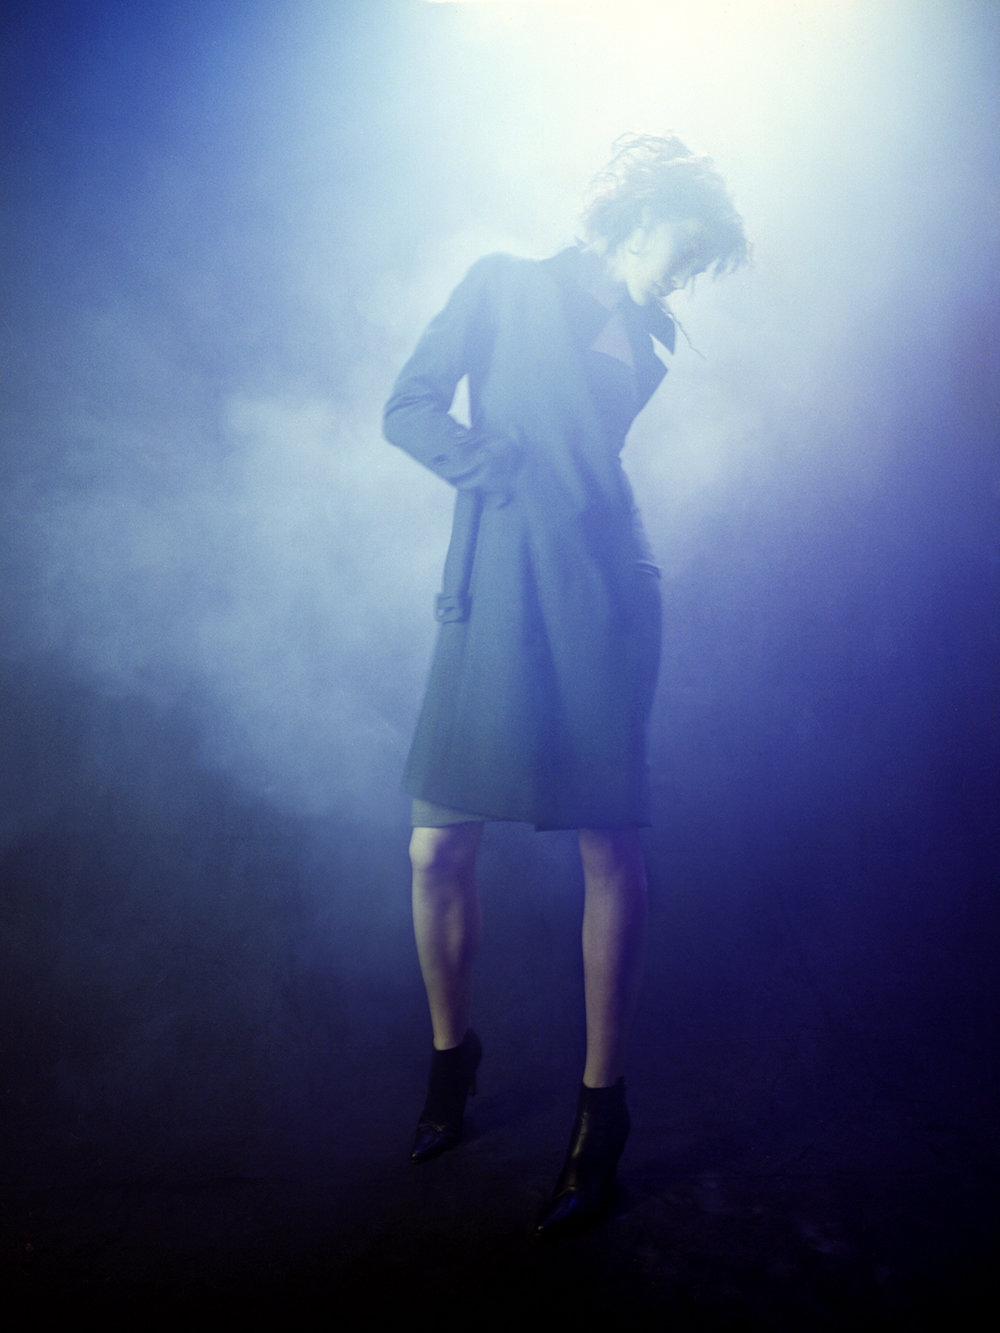 Blue+smoke+and+fashion+lights+Patrik+Anderson+photographer.jpeg